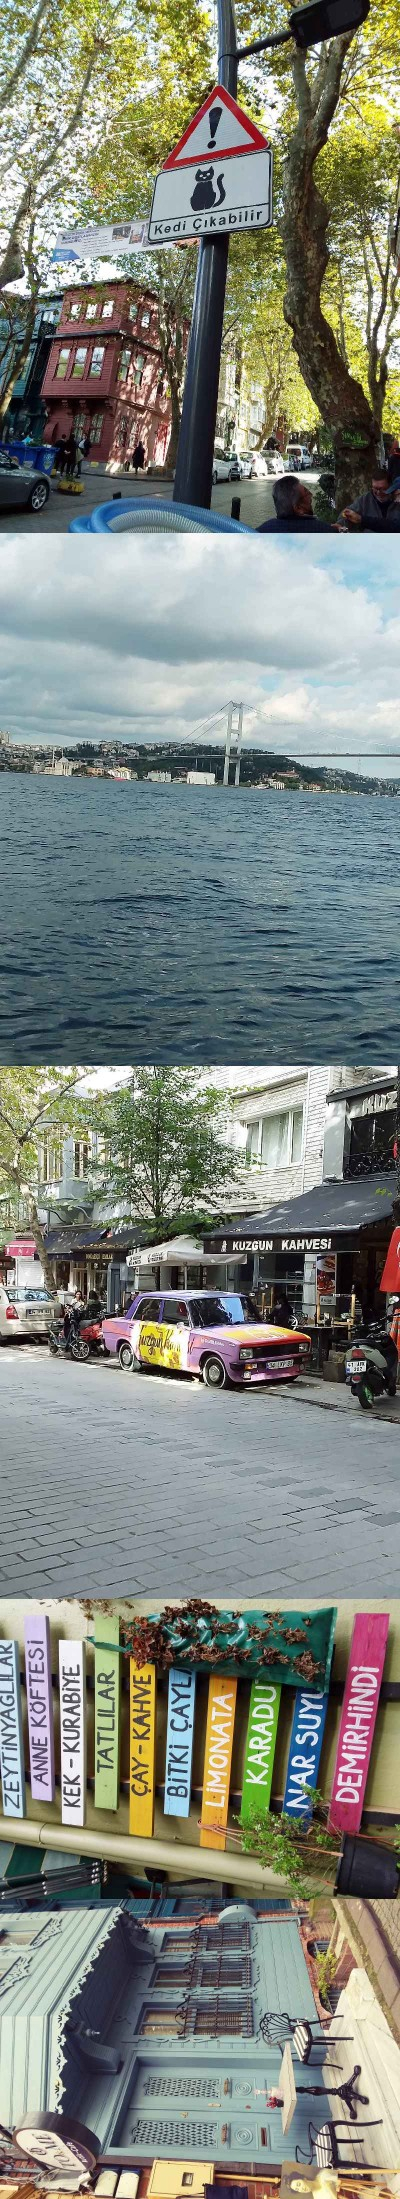 İSTANBUL | msy | Digital Drawing | PENUP